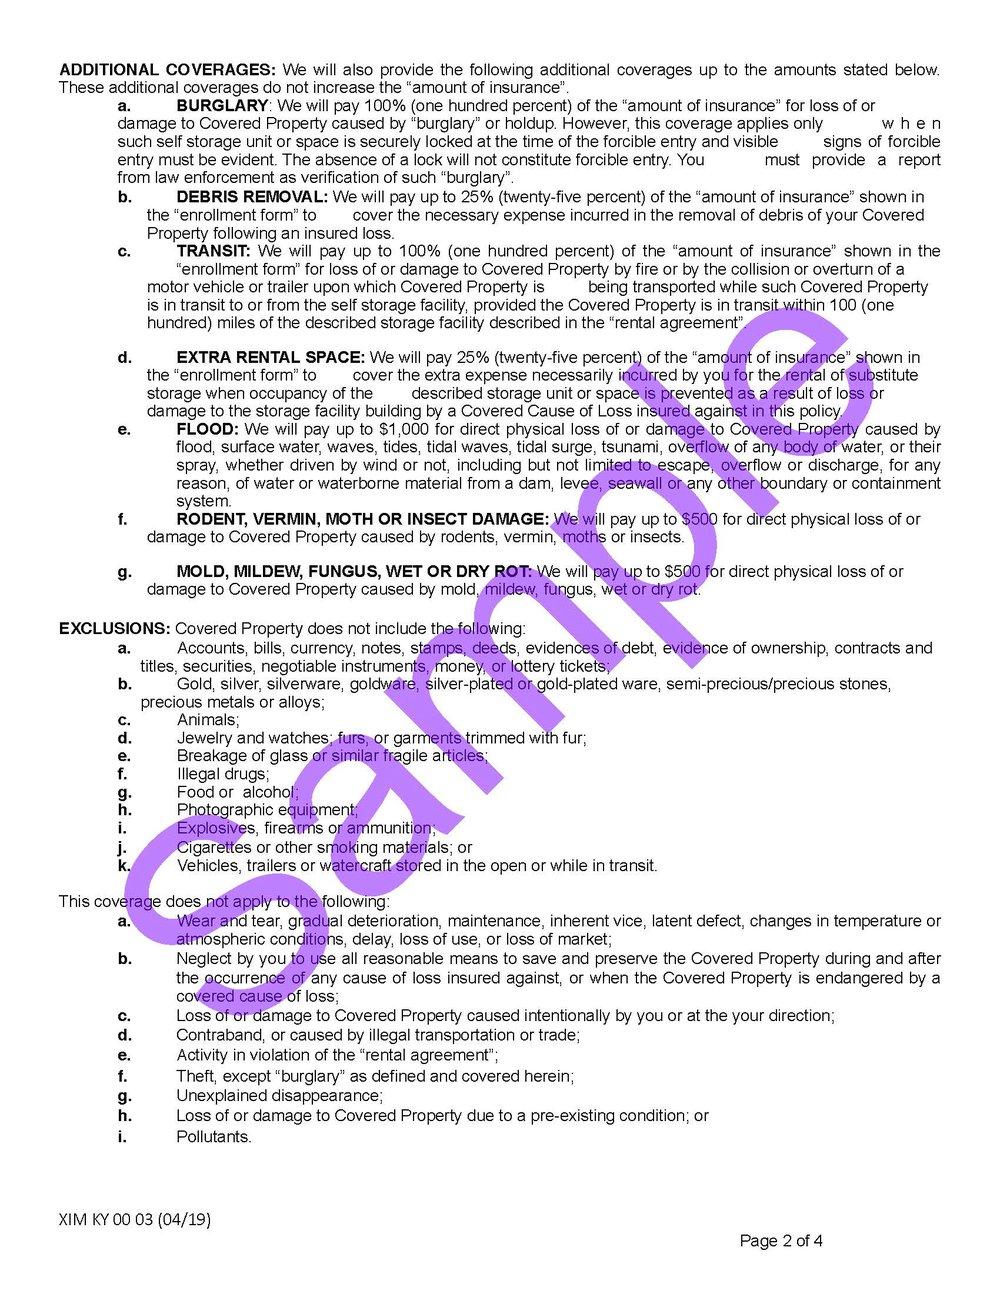 XIM KY 00 03 04 19 Kentucky Certificate of InsuranceSample_Page_2.jpg